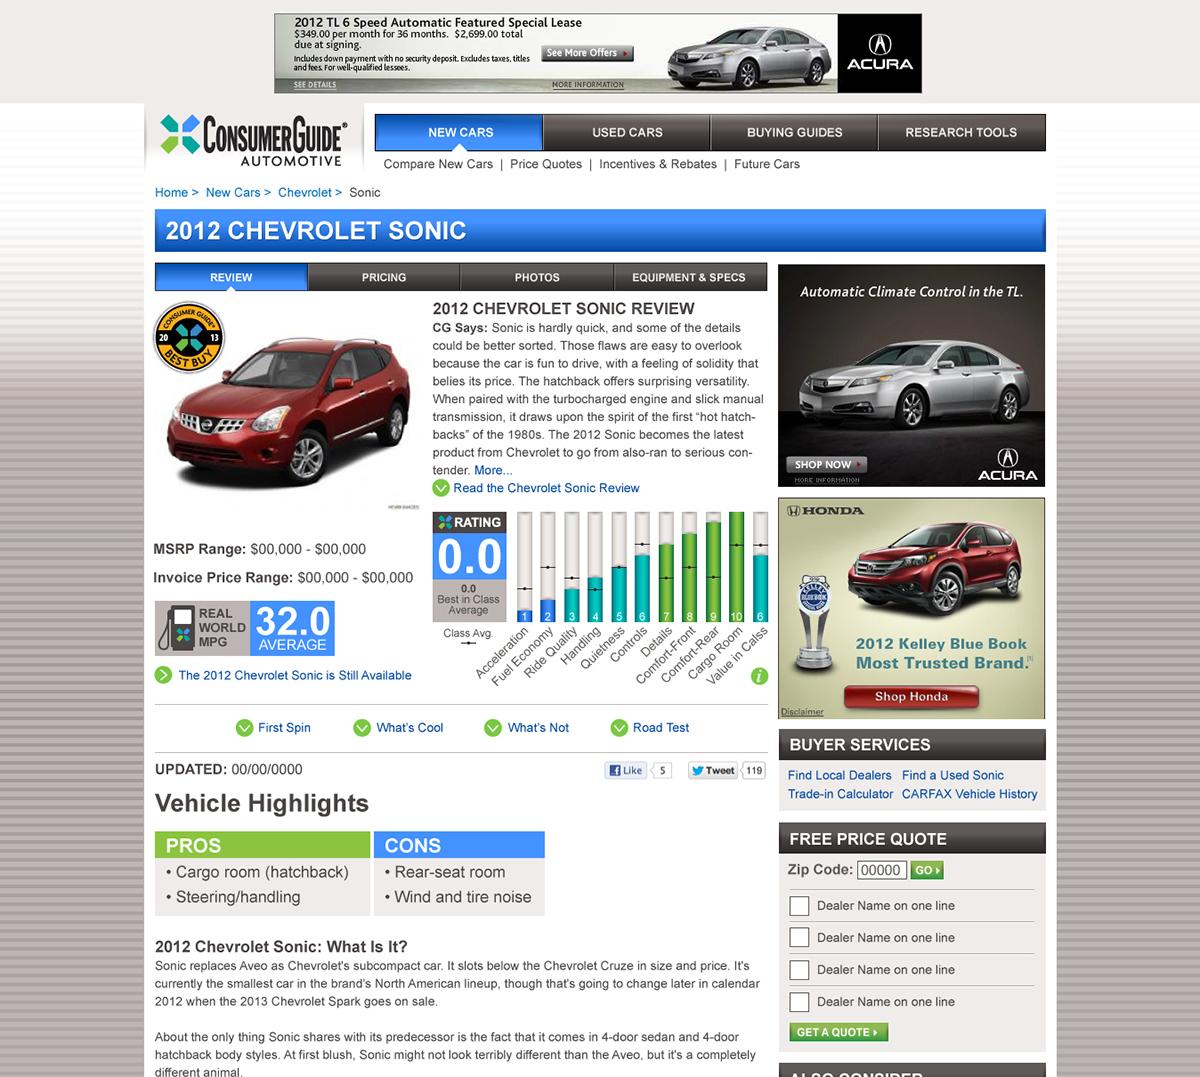 consumer guide automotive website design on behance rh behance net Hyundai Logo Consumer Car Guide